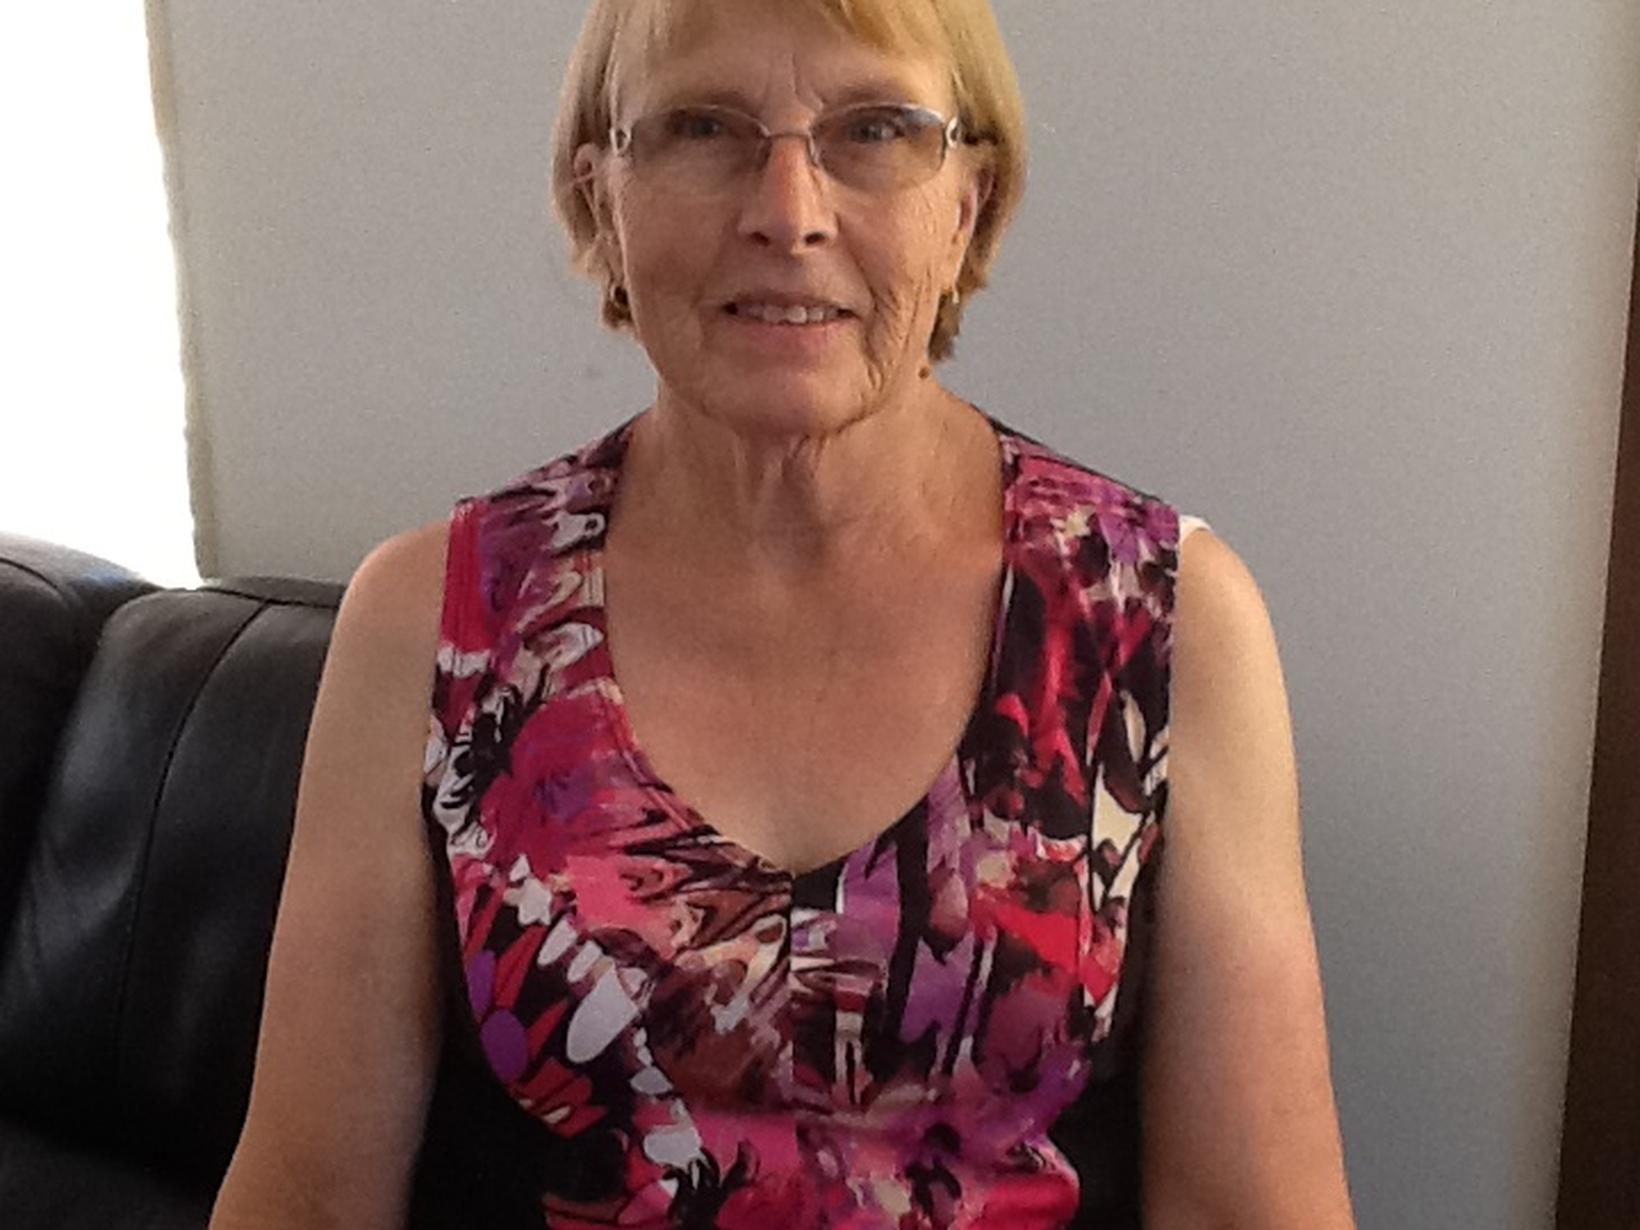 Antonia from Perth, Western Australia, Australia